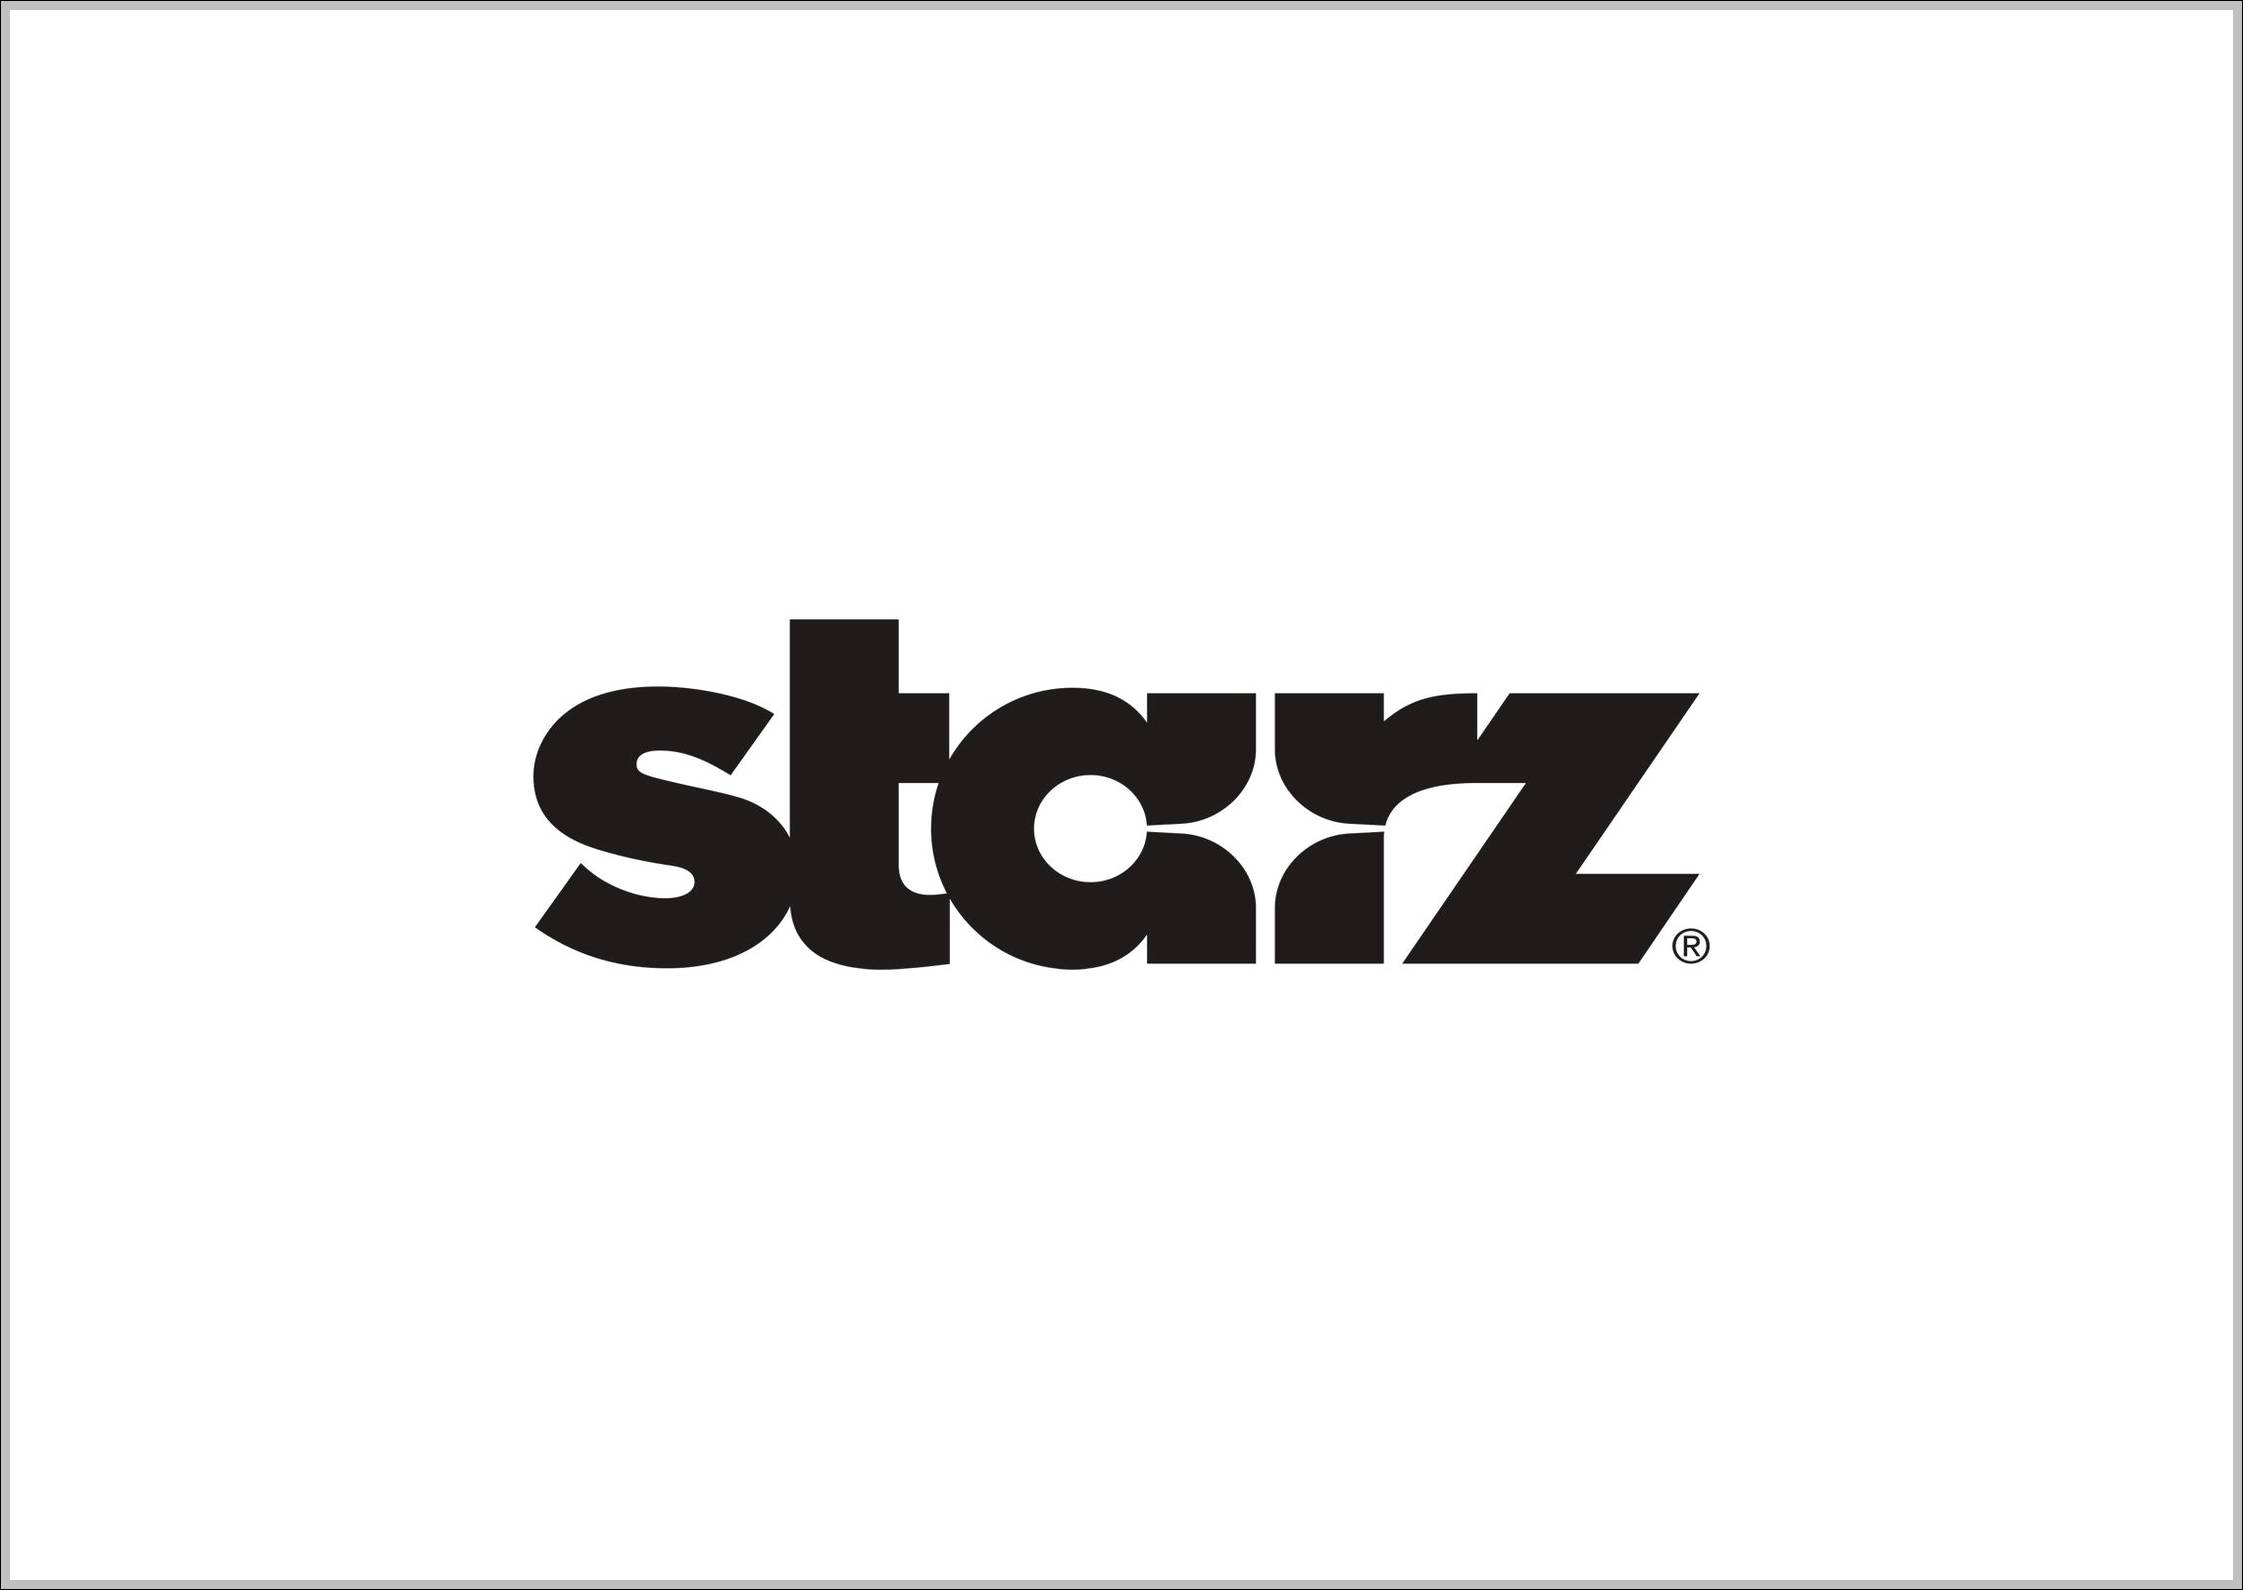 Starz logo 2008